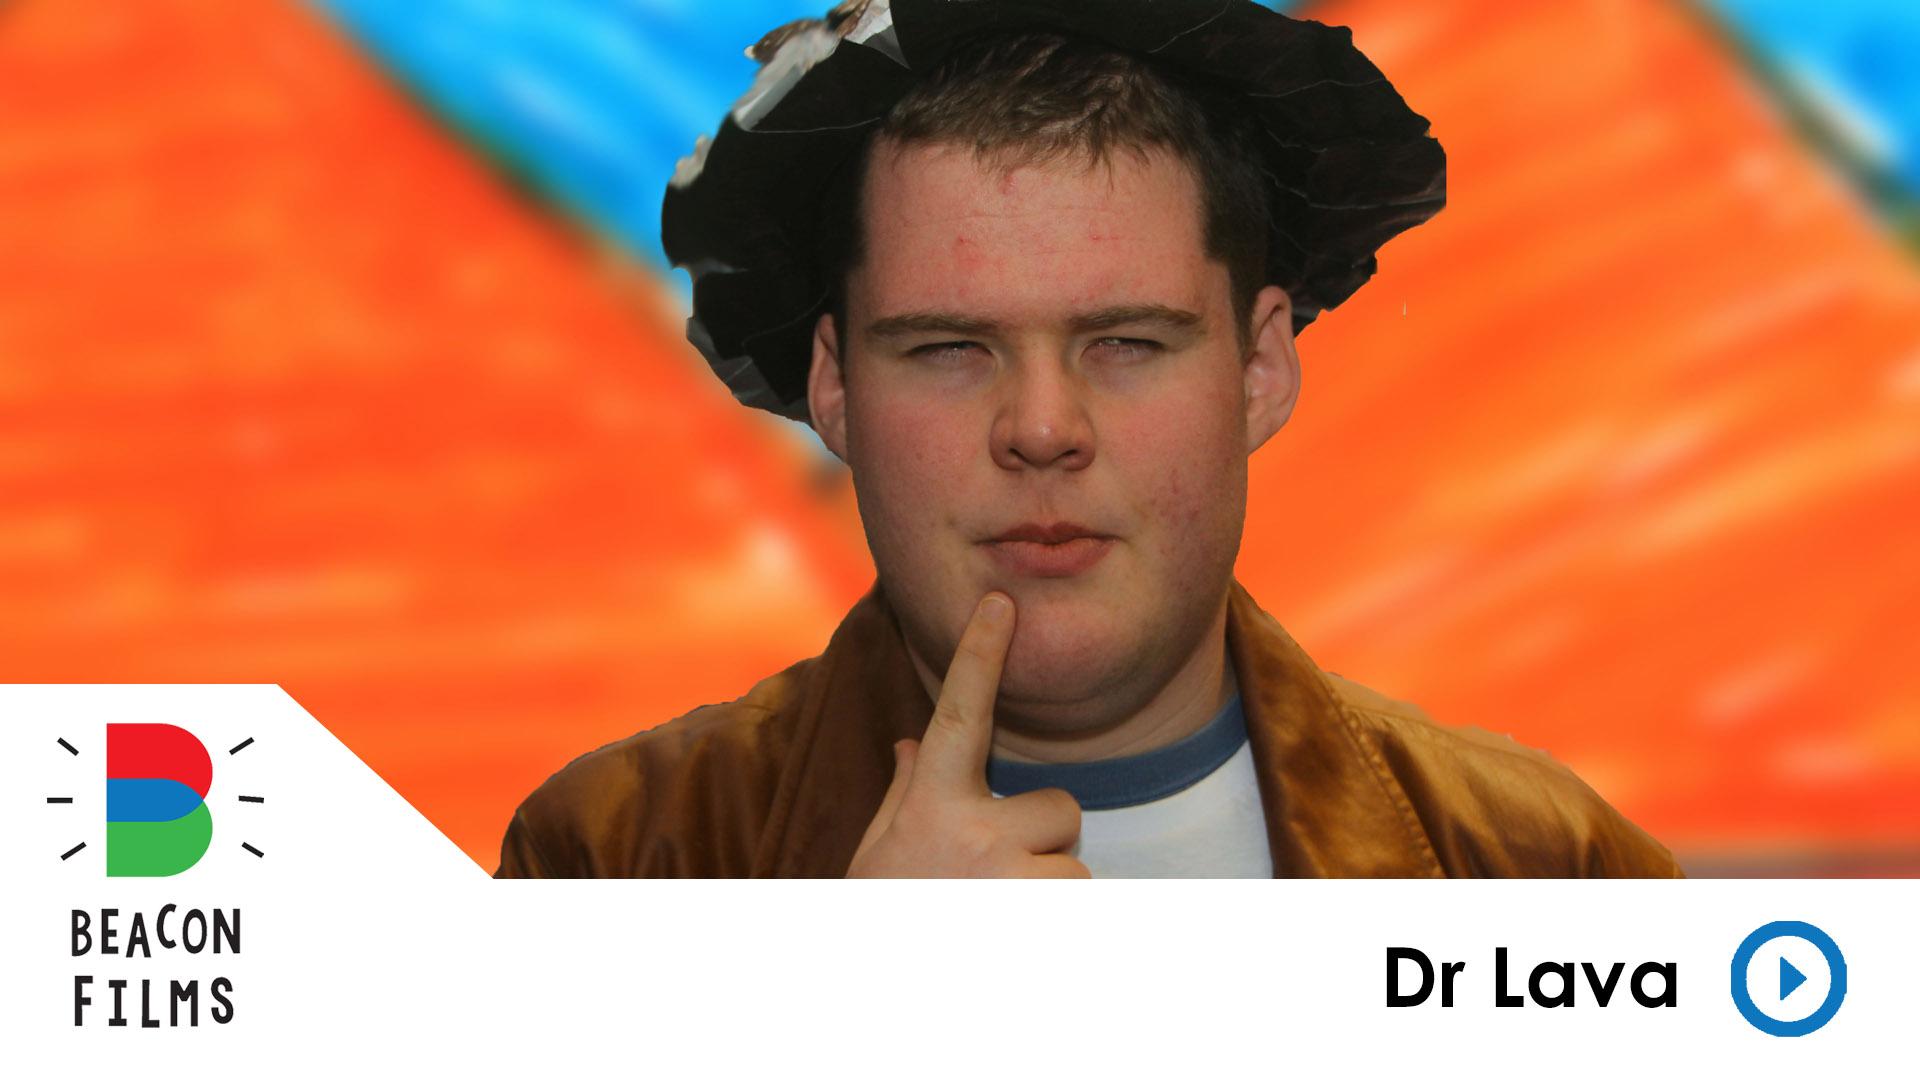 dr lava.jpg